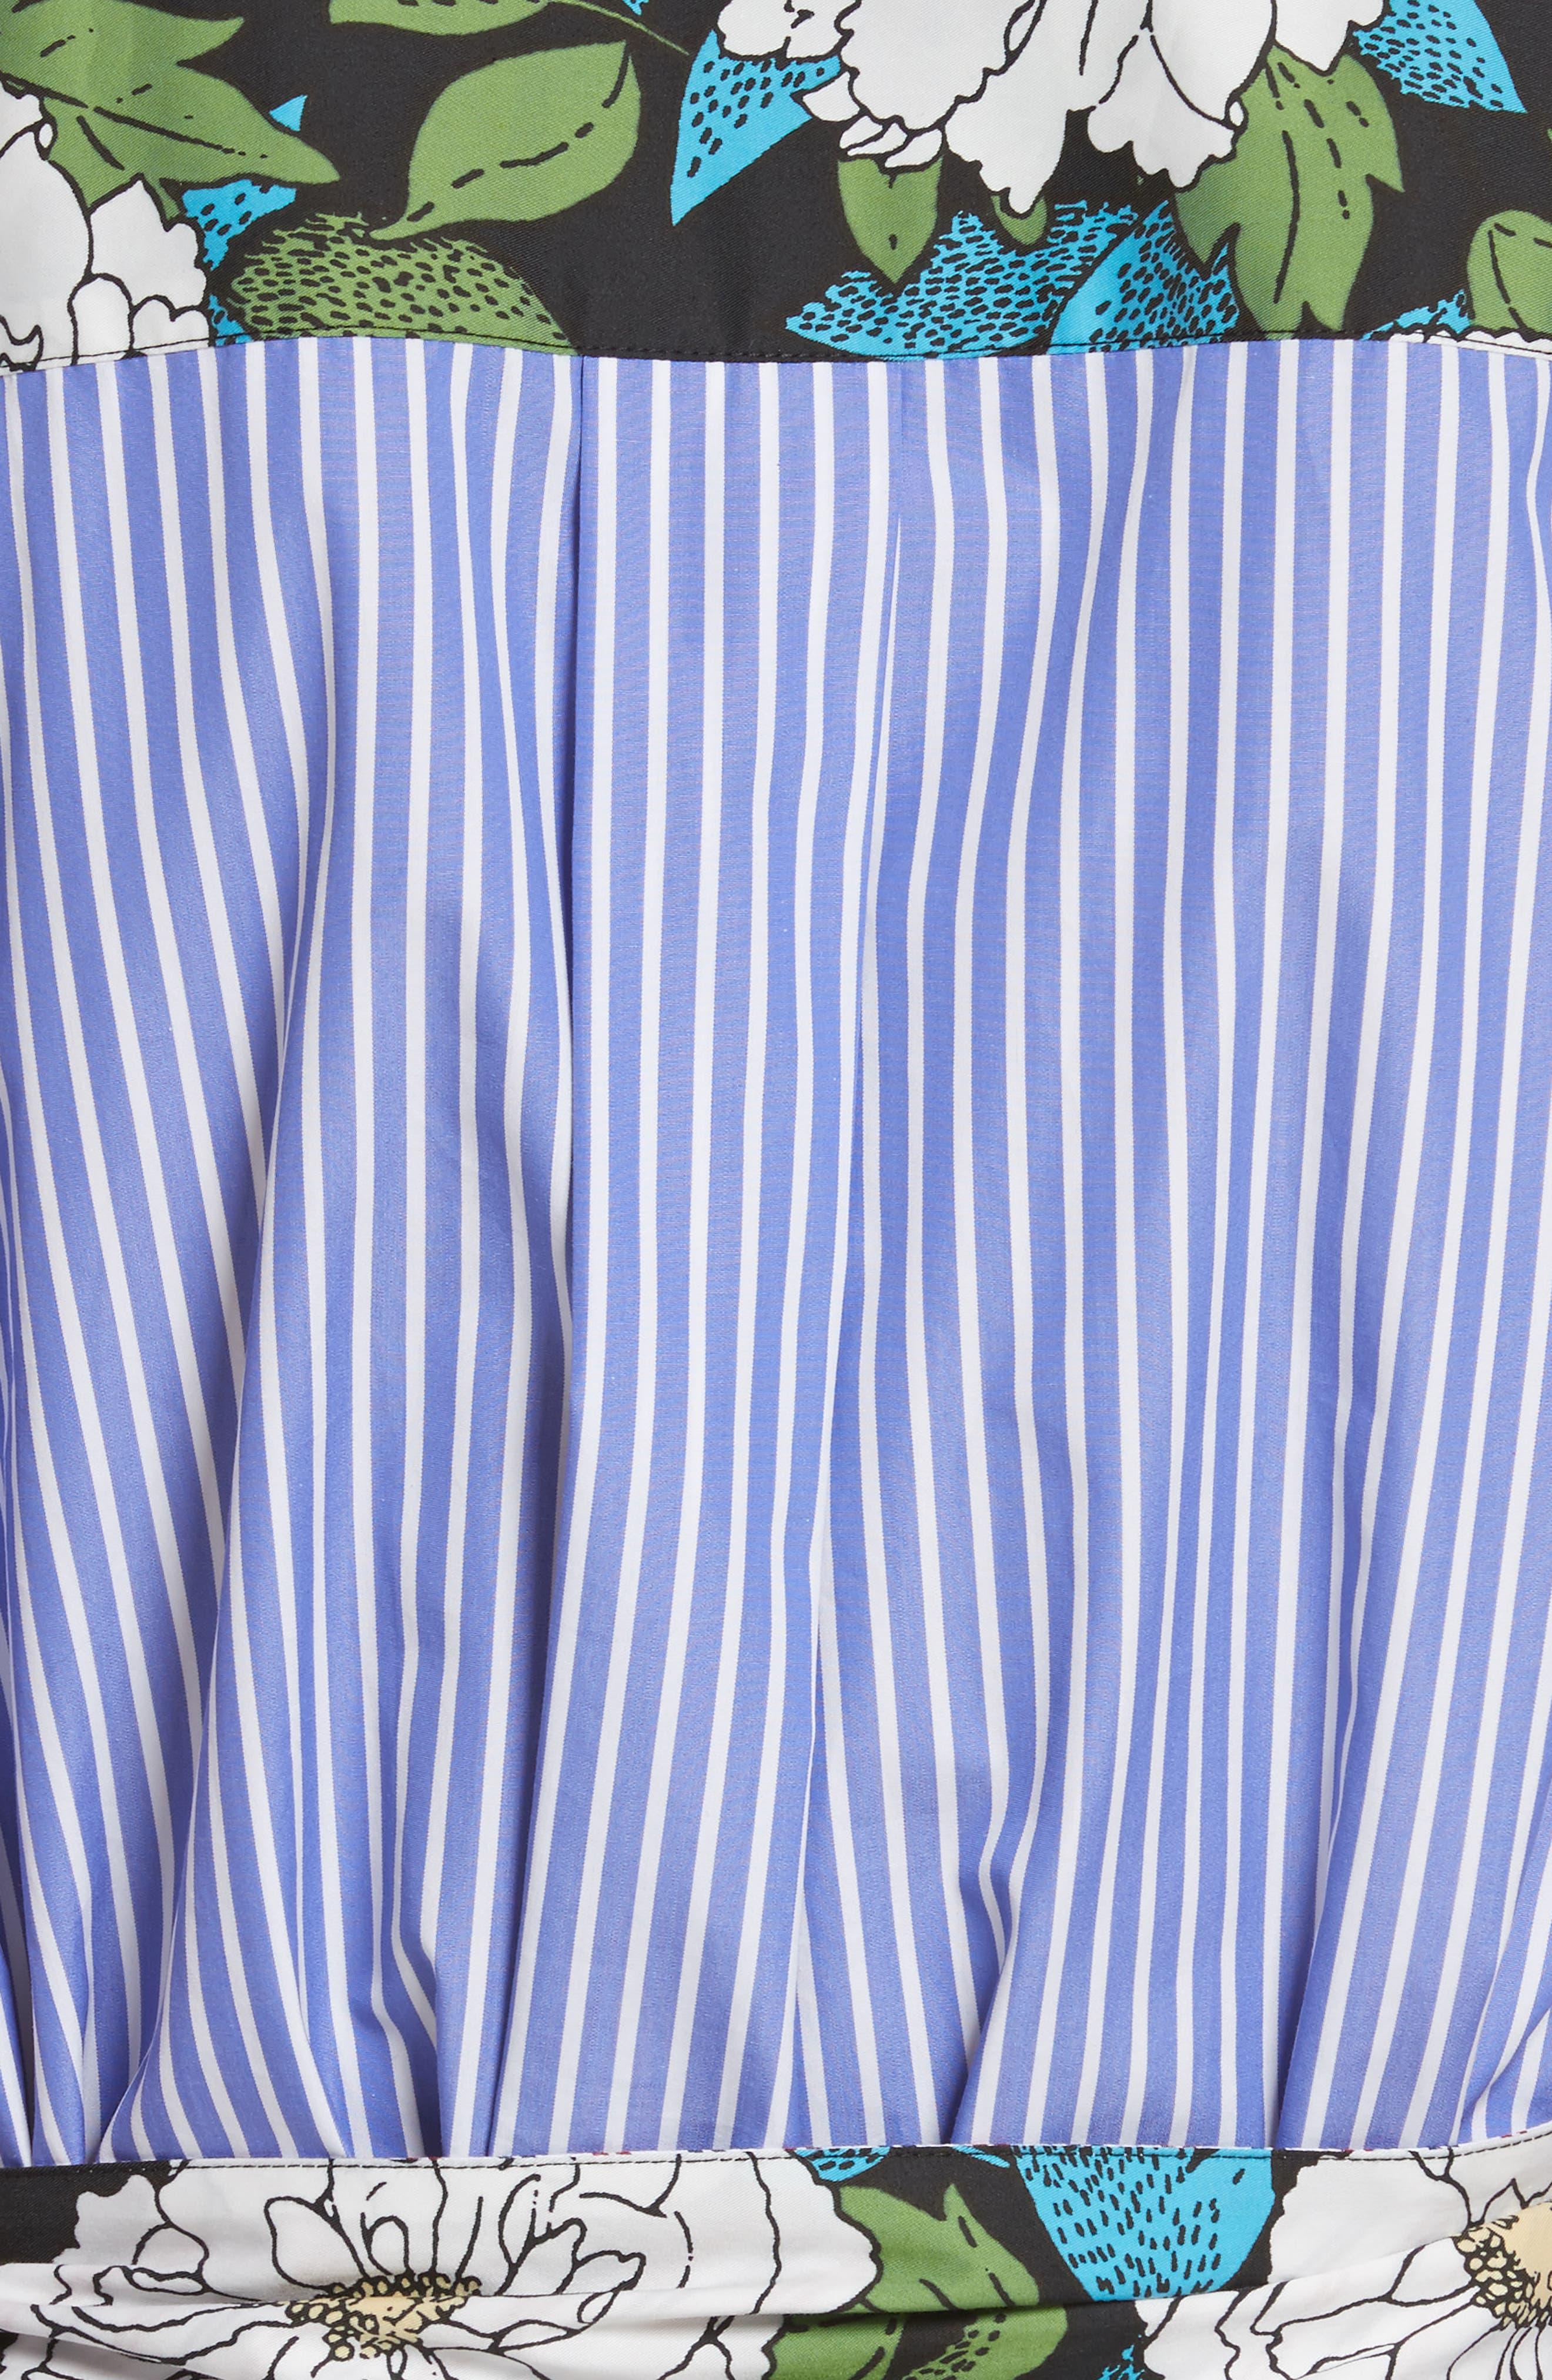 Diane von Furstenberg Mixed Print Cotton Shirtdress,                             Alternate thumbnail 5, color,